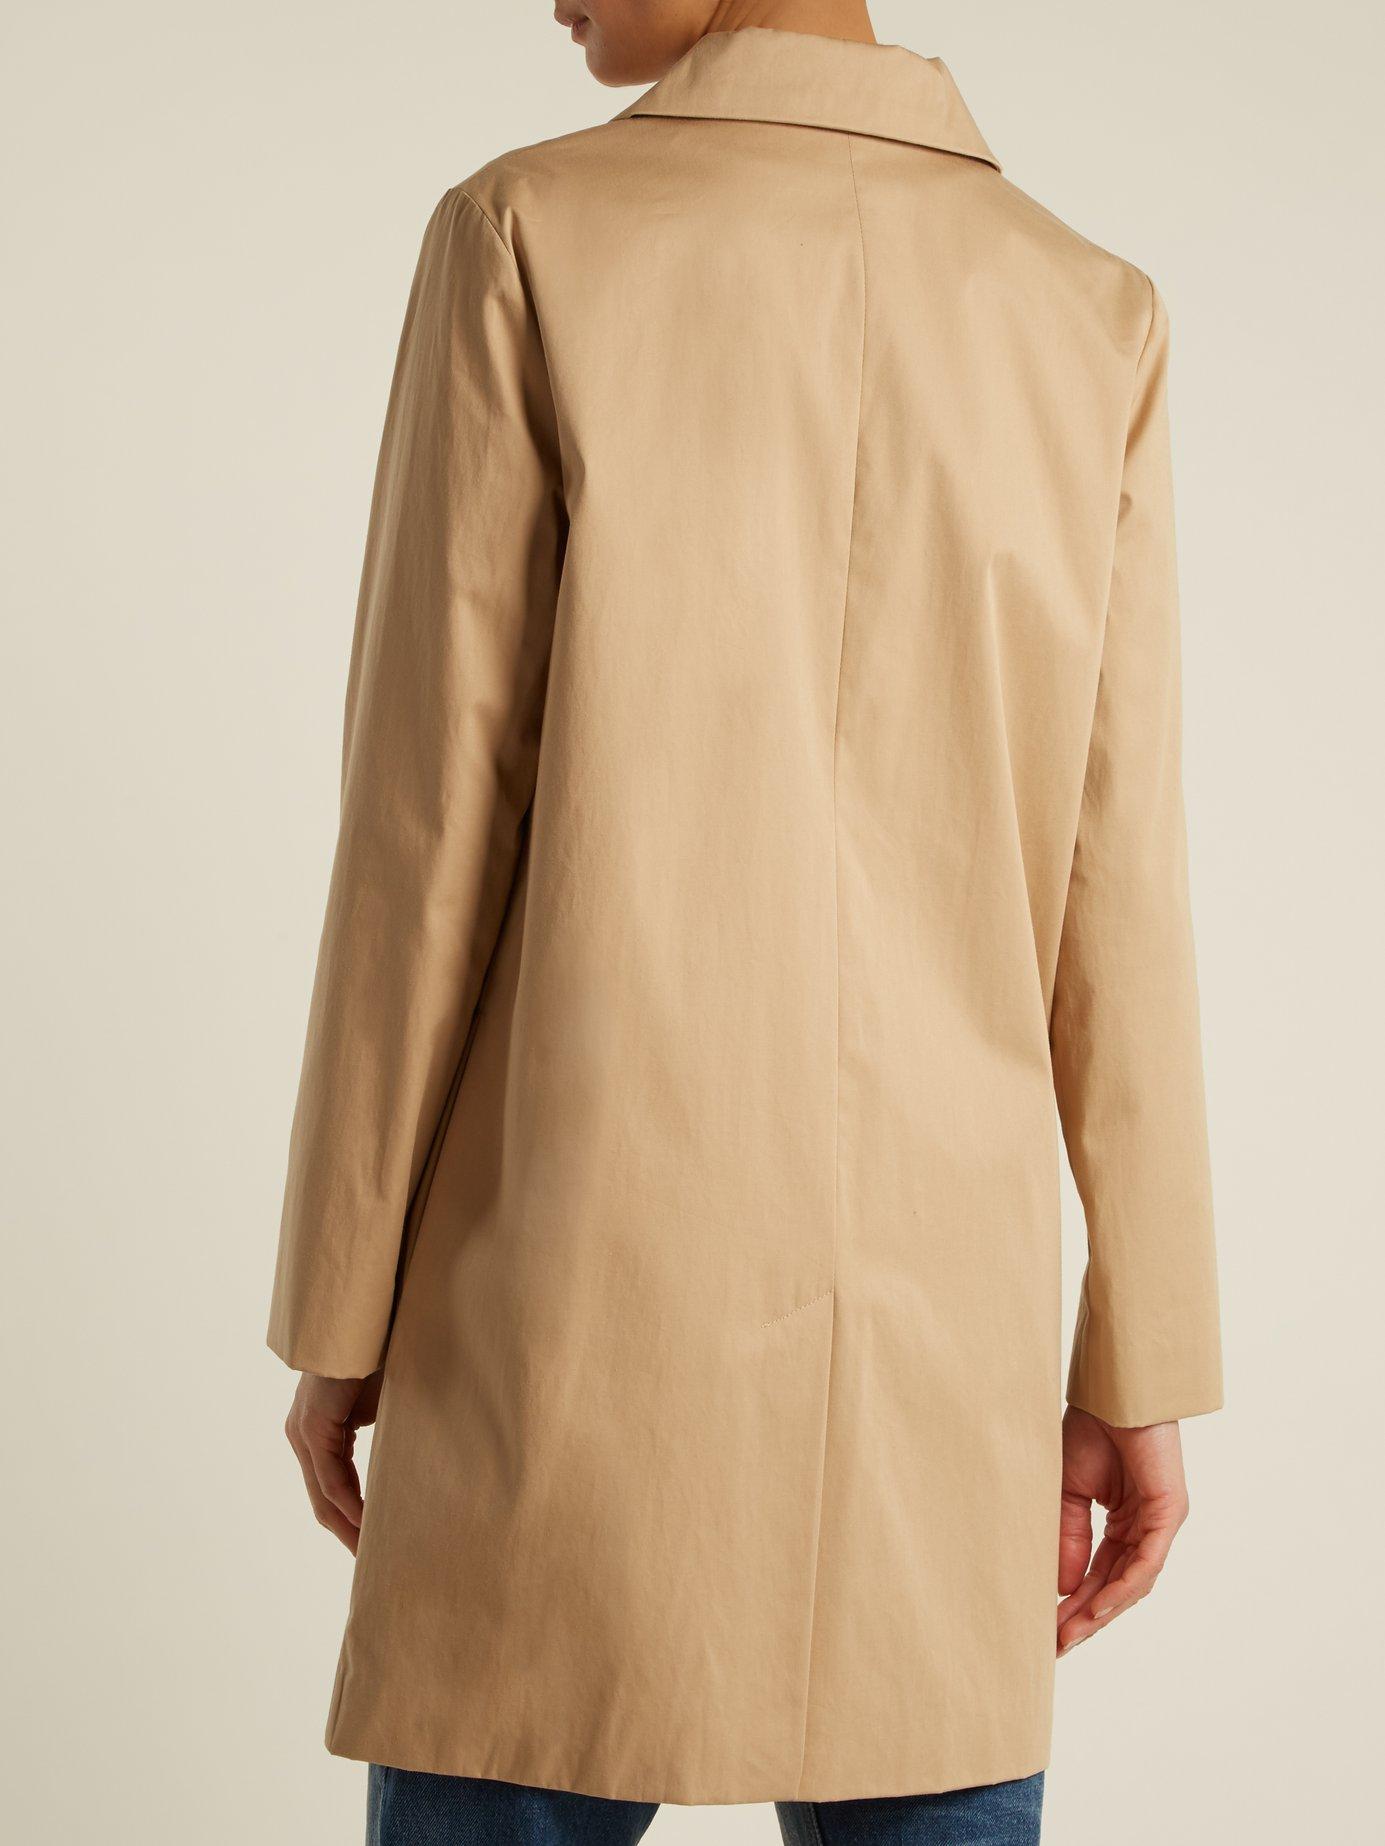 Dolly cotton-blend gabardine coat by A.P.C.